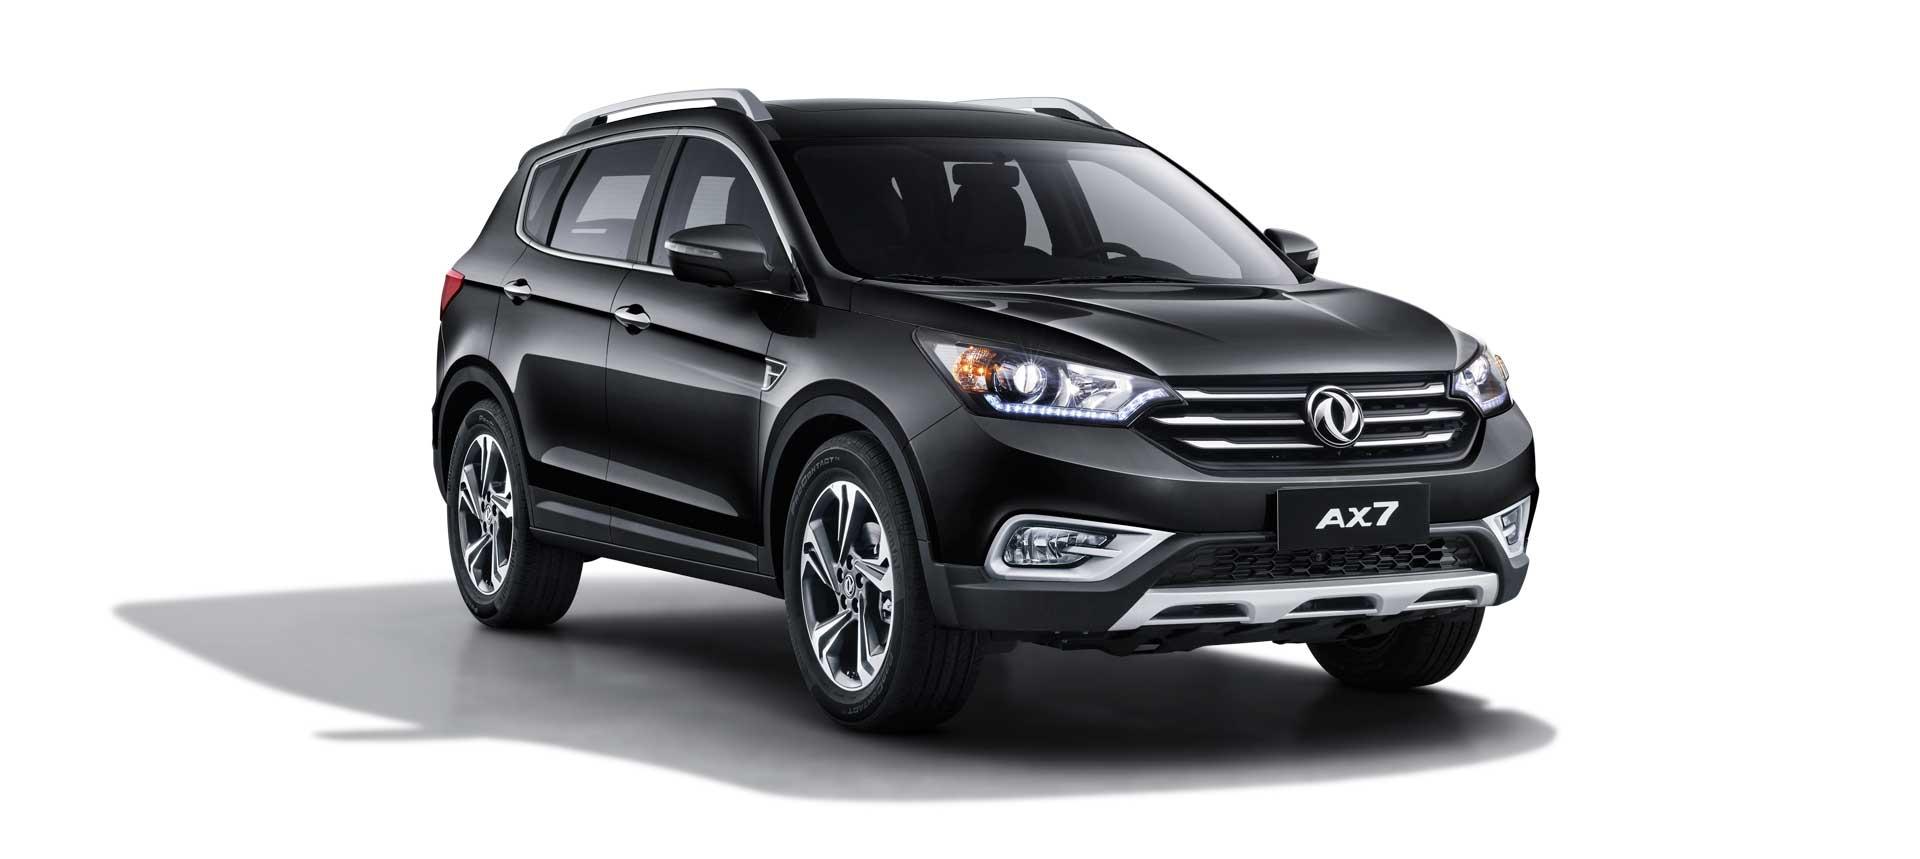 AX7 SUV Motor Peugeot 2.0 /6AT Secuencial